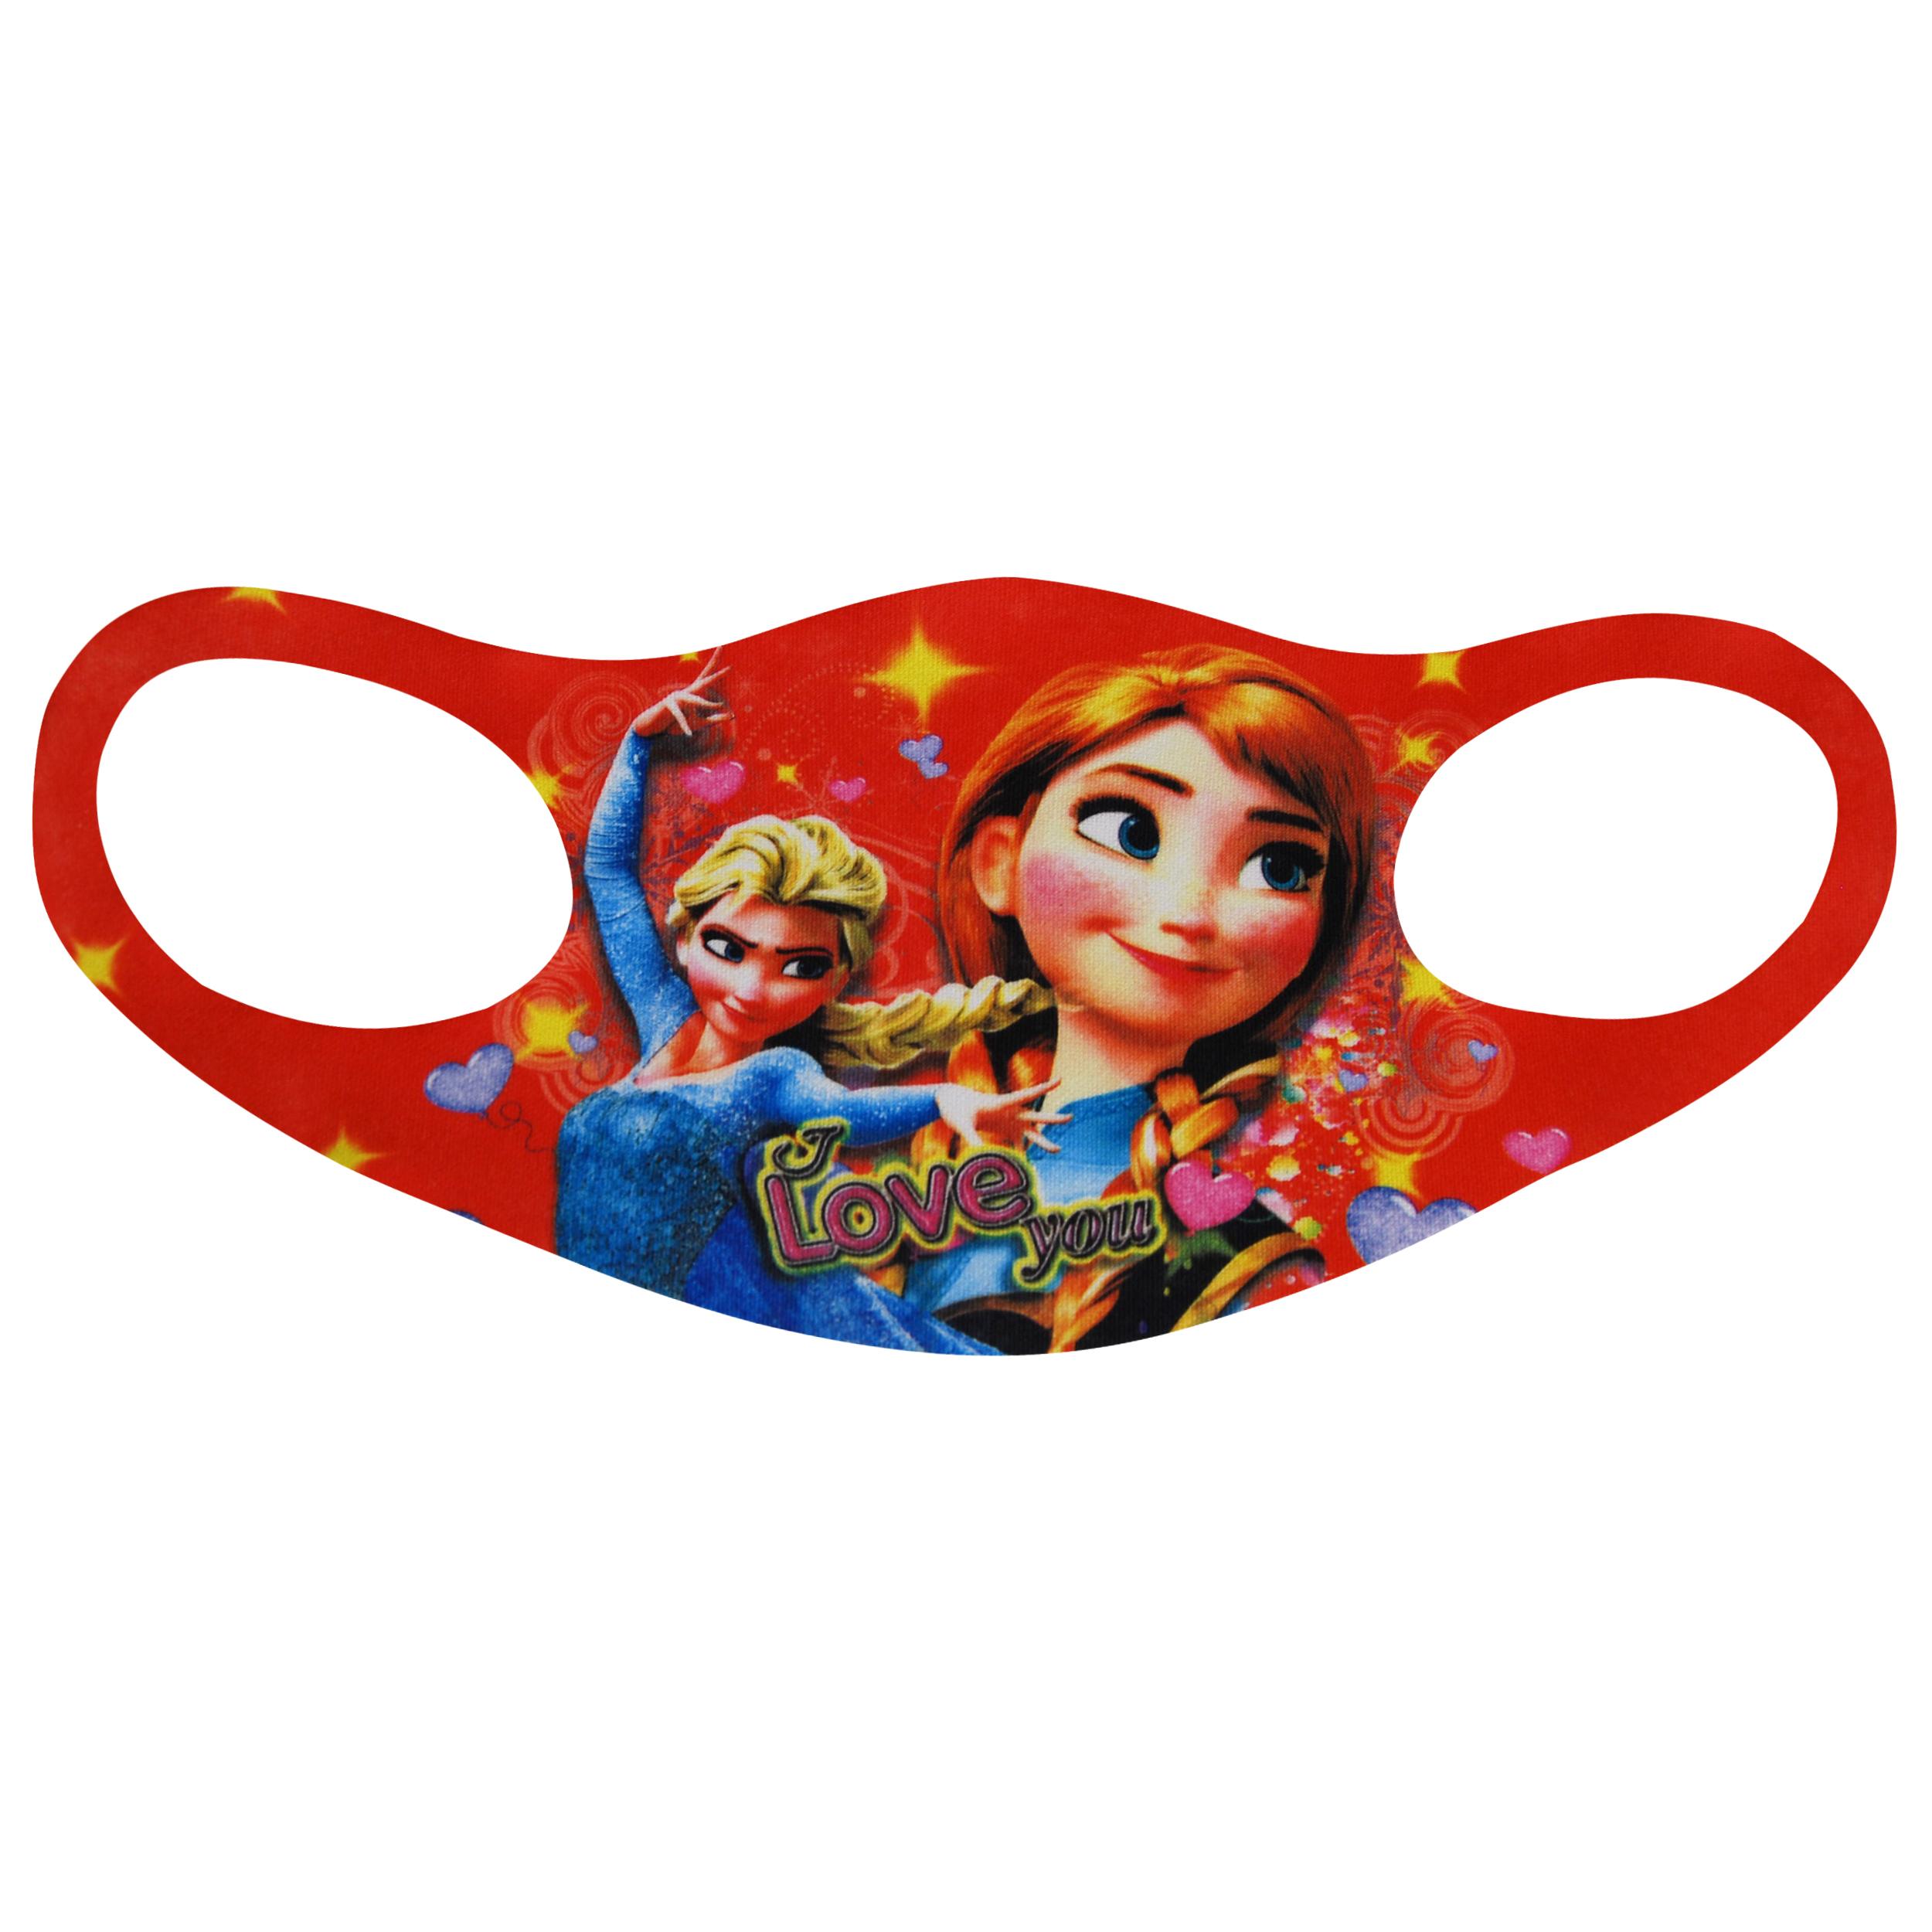 ماسک تزیینی بچگانه ماییلدا طرح کارتون کد 3501-1